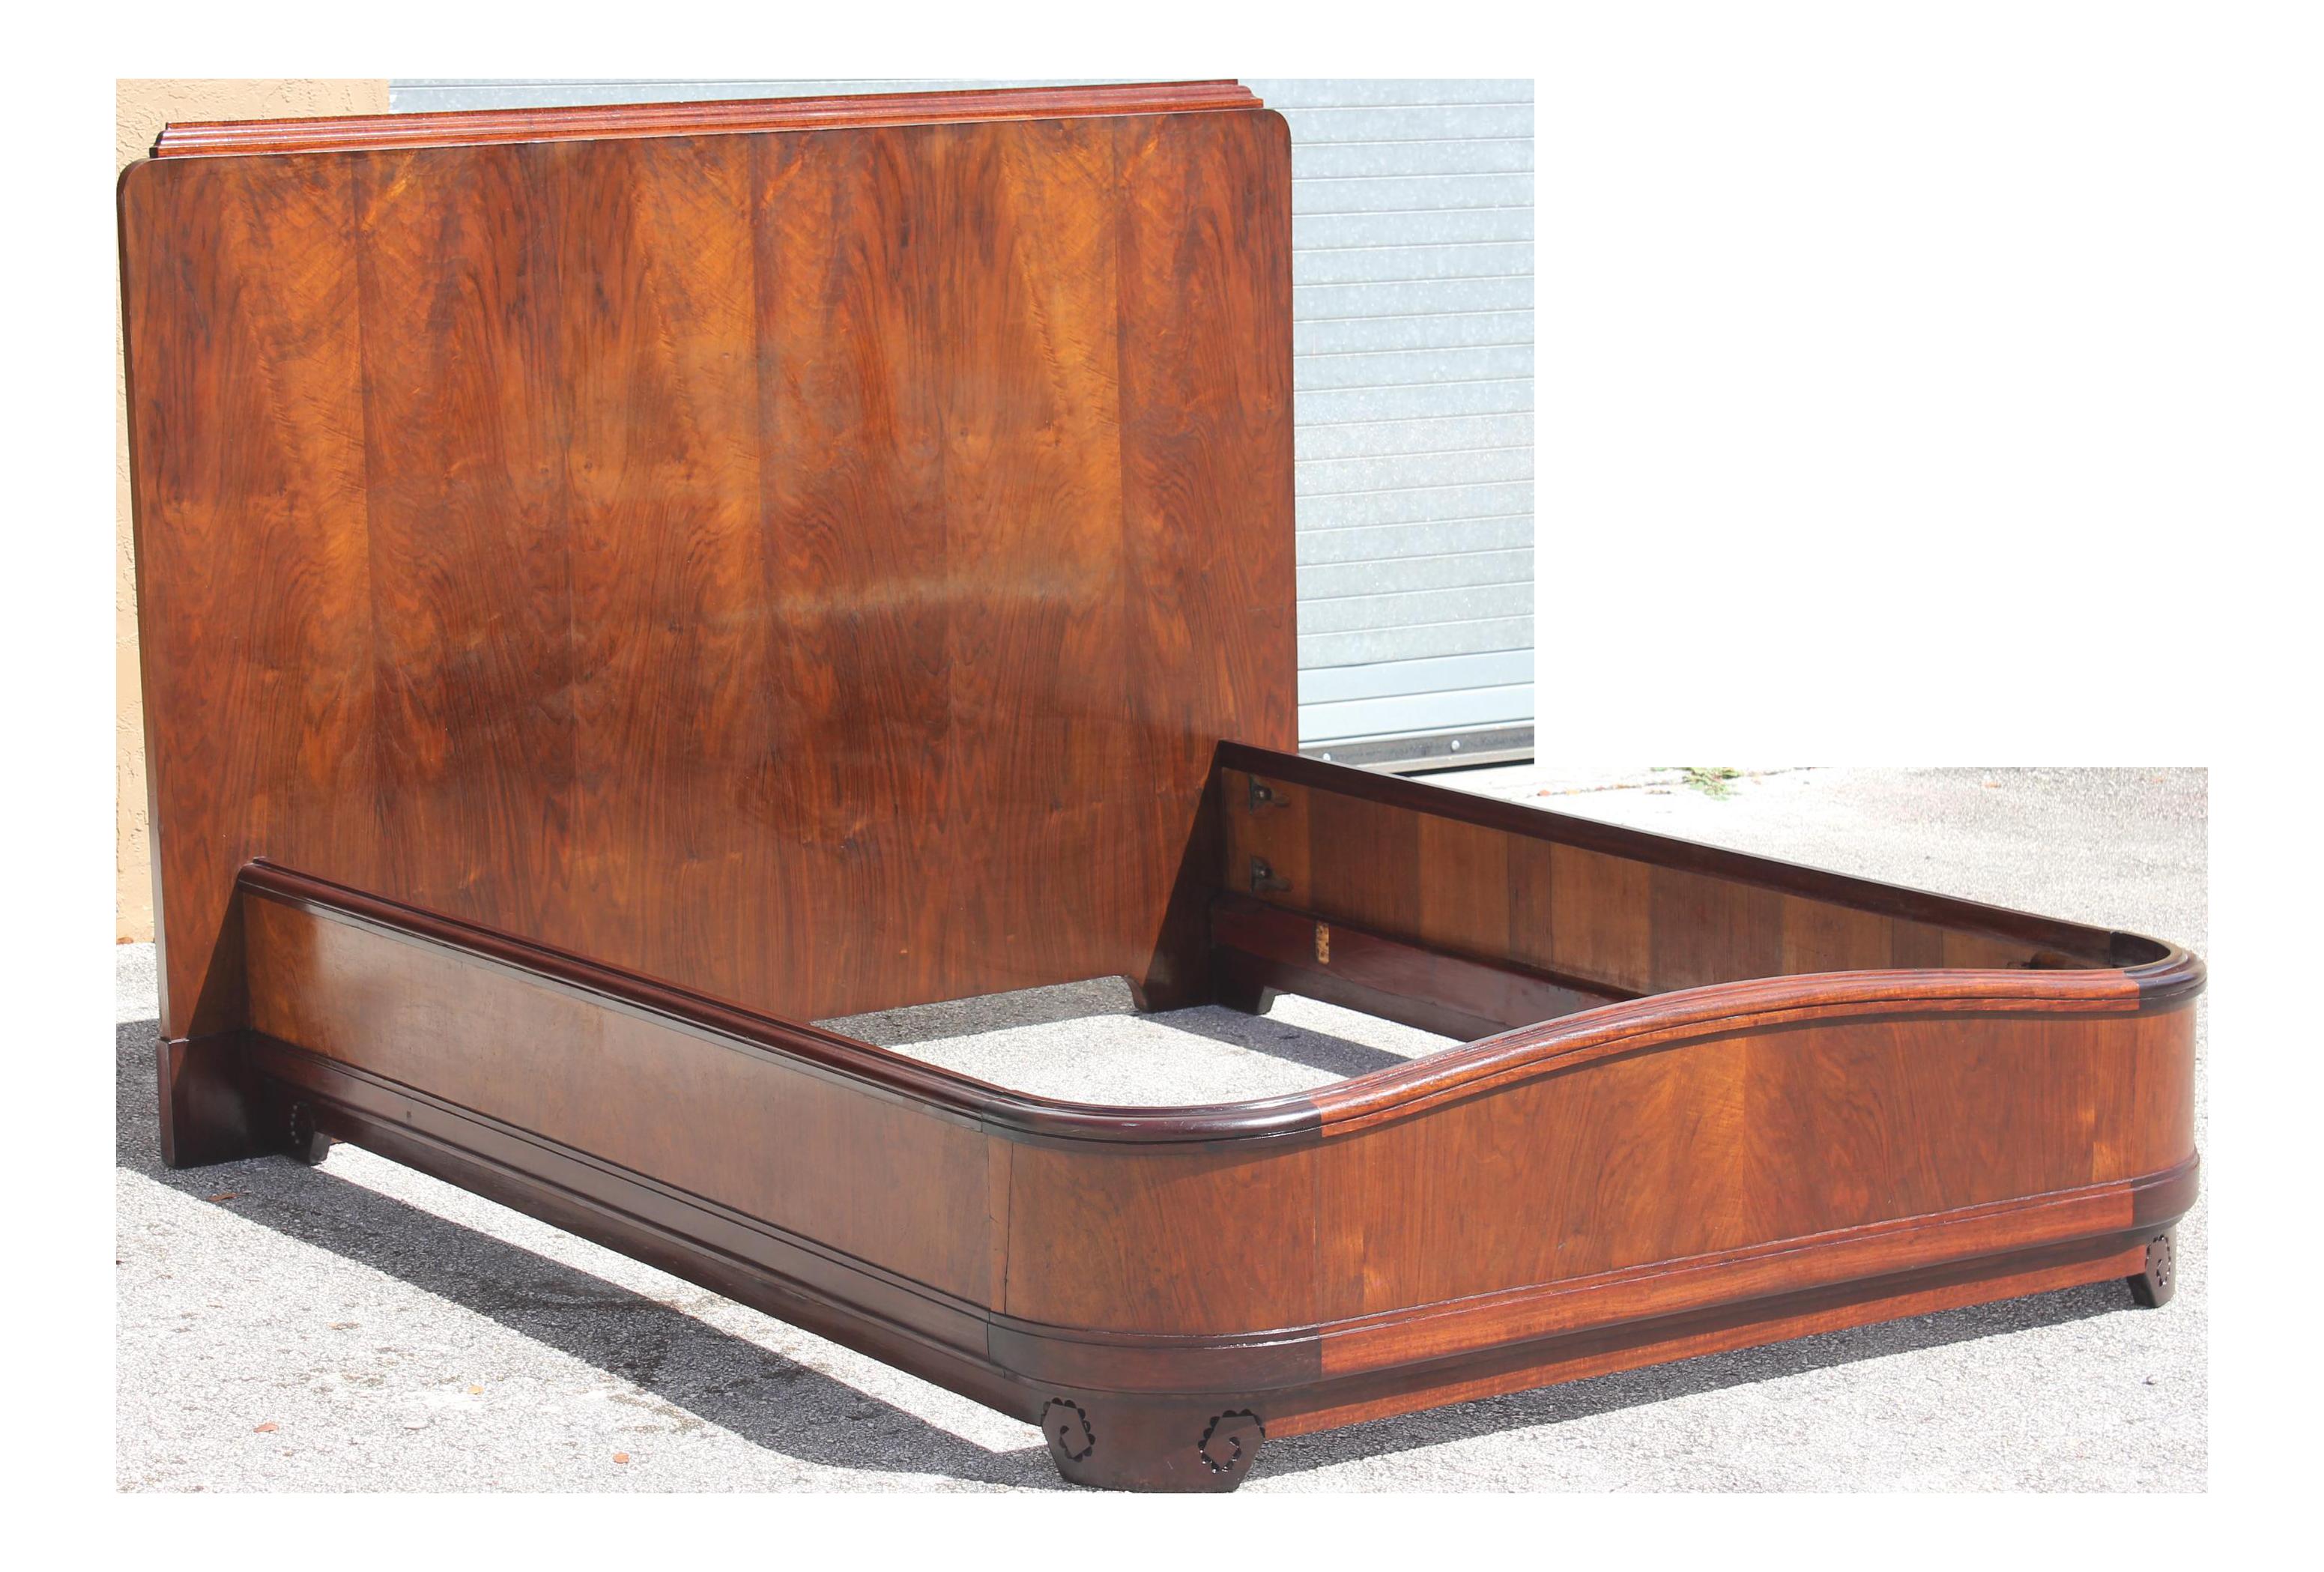 Wooden furniture box beds - Wooden Furniture Box Beds